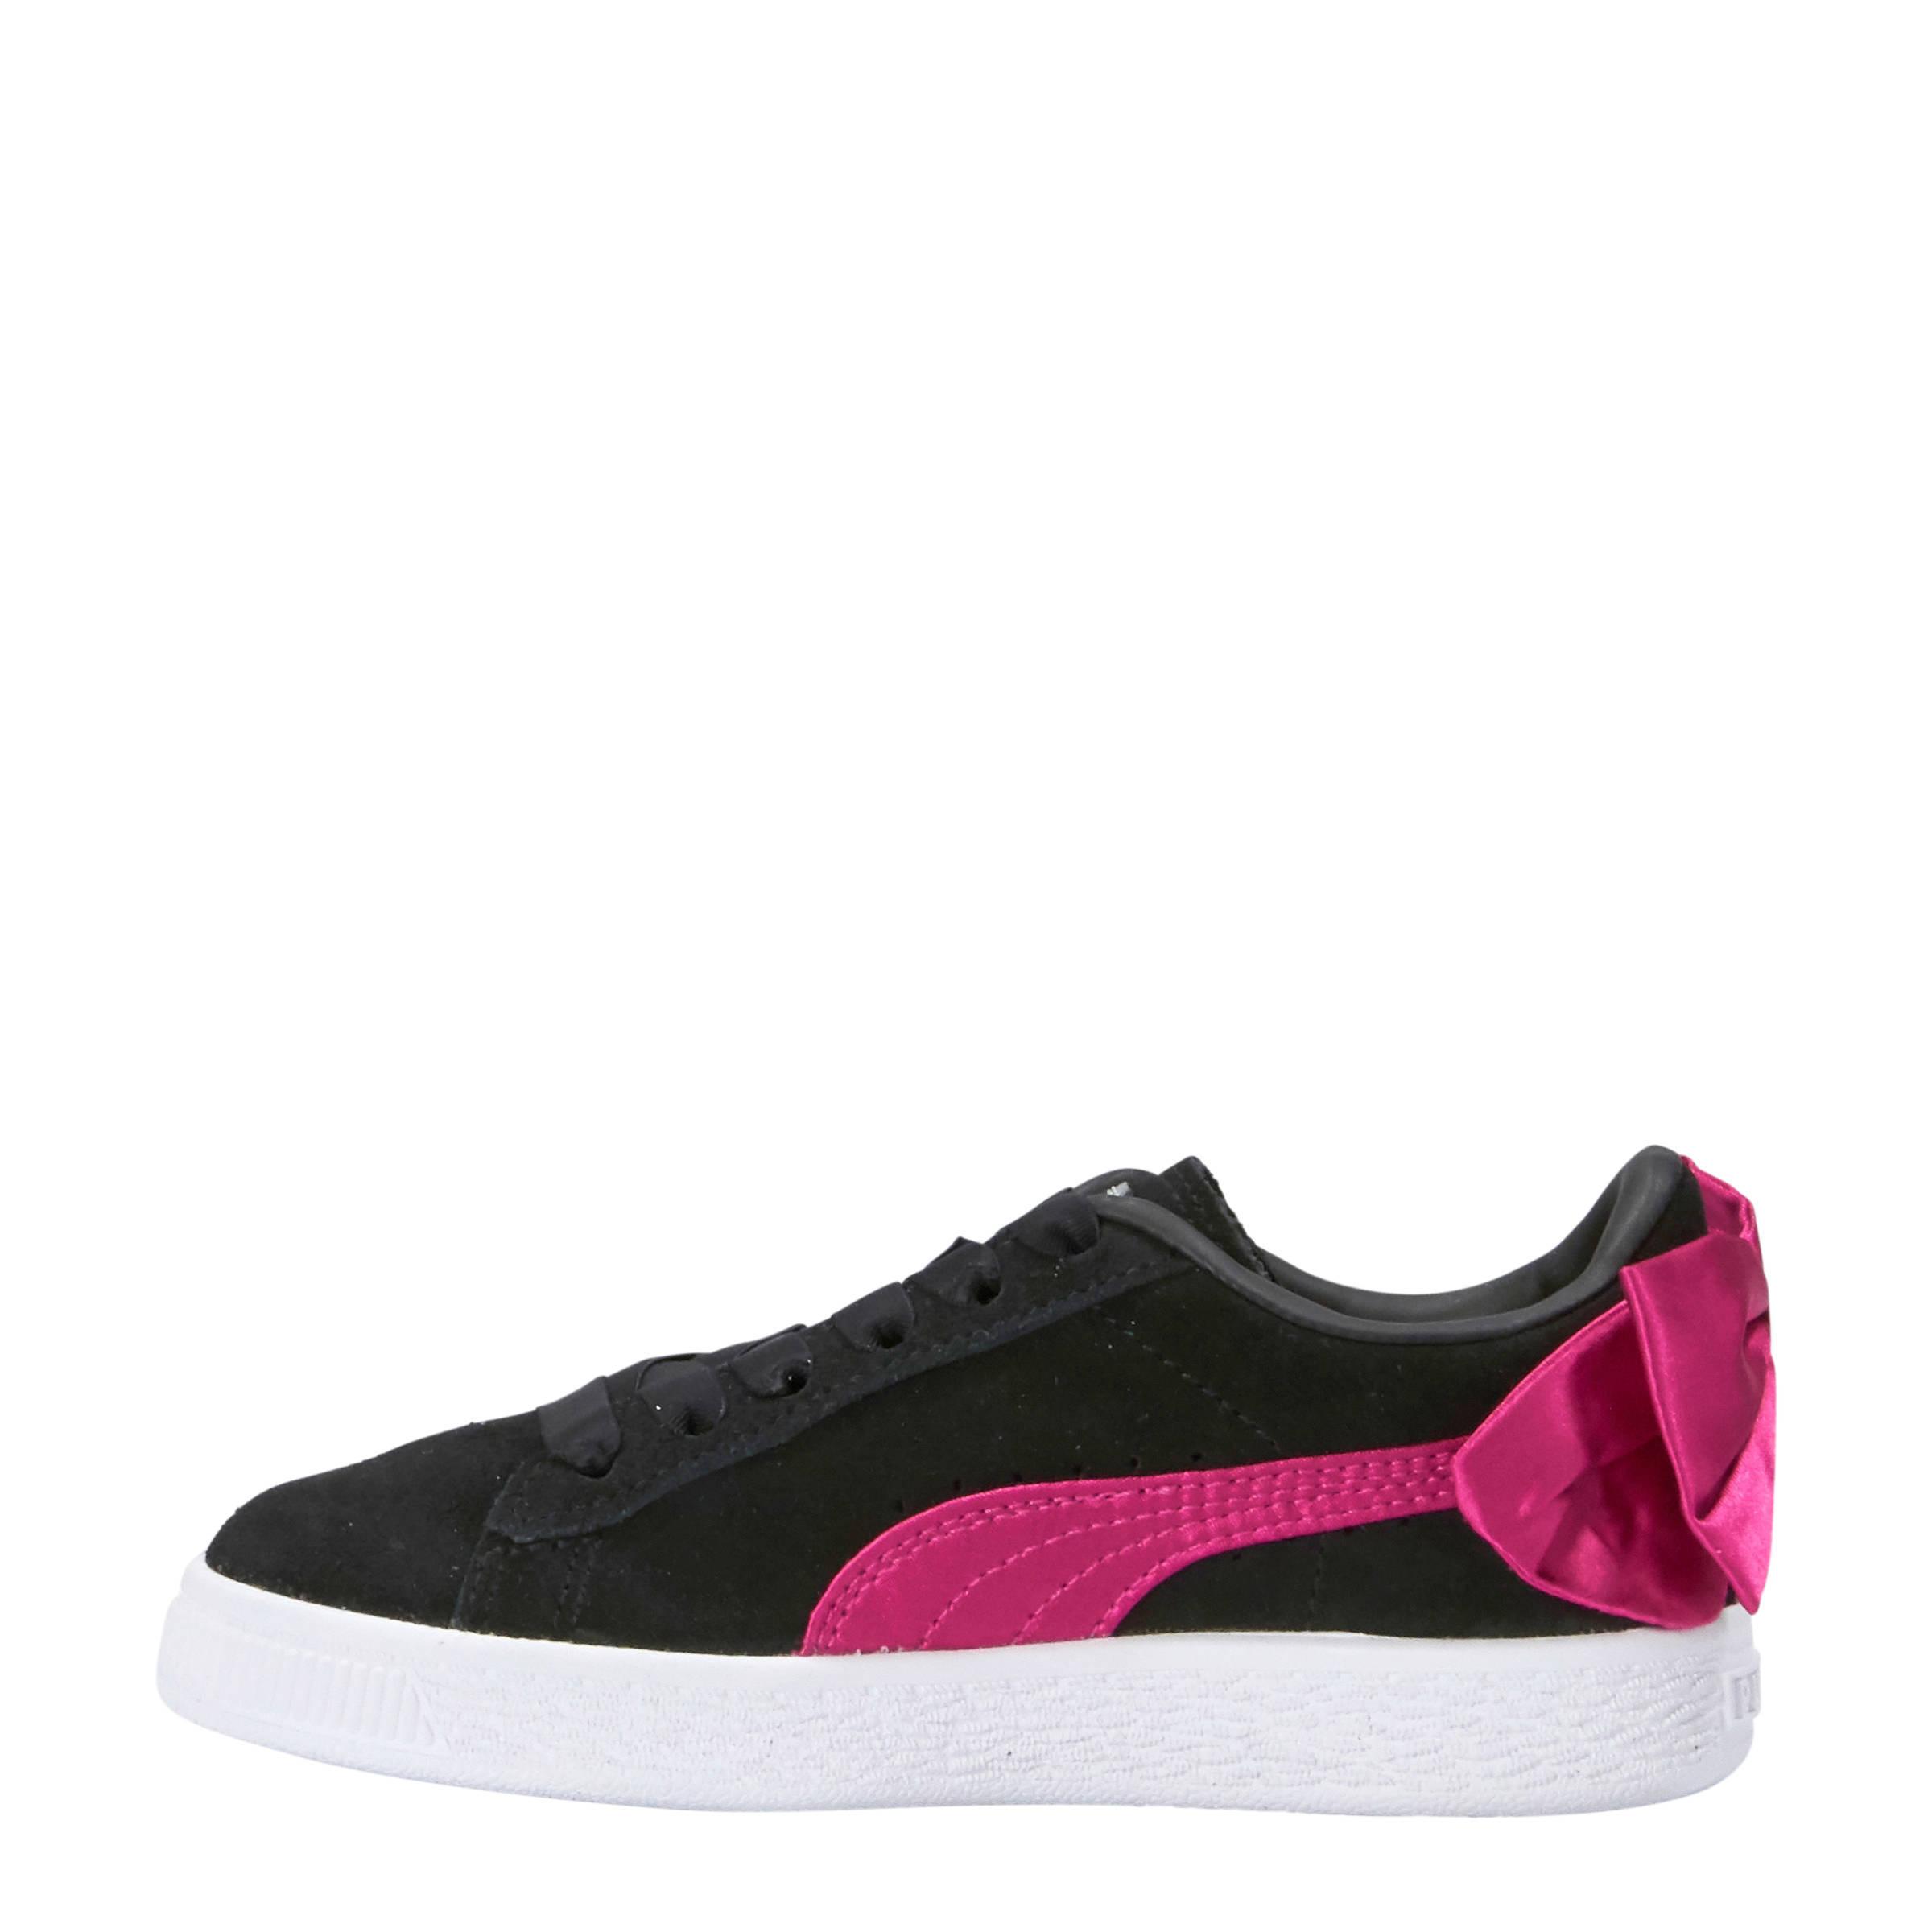 Puma Suède Bow AC PS sneakers roze | wehkamp